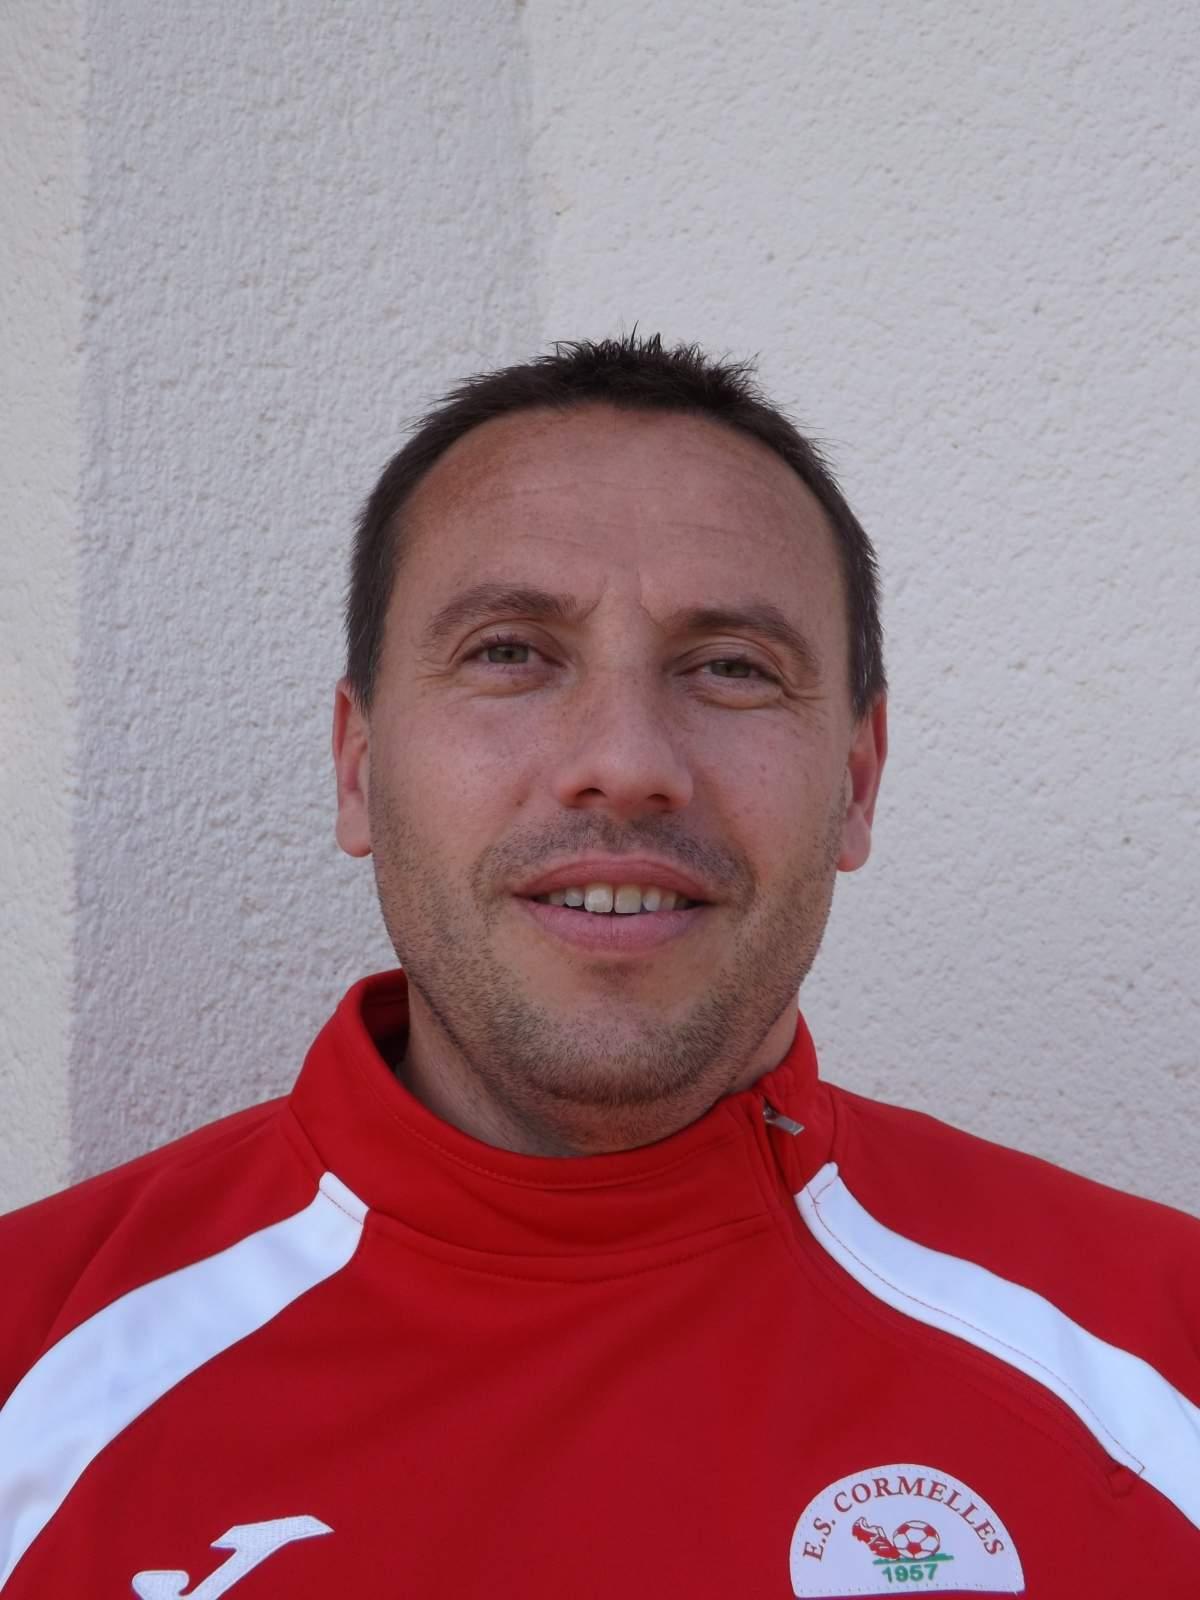 Joueur - <b>Olivier LEMESLE</b> - club Football E.S.CORMELLES FOOTBALL - Footeo - olivier-lemesle-2__o1ieyd